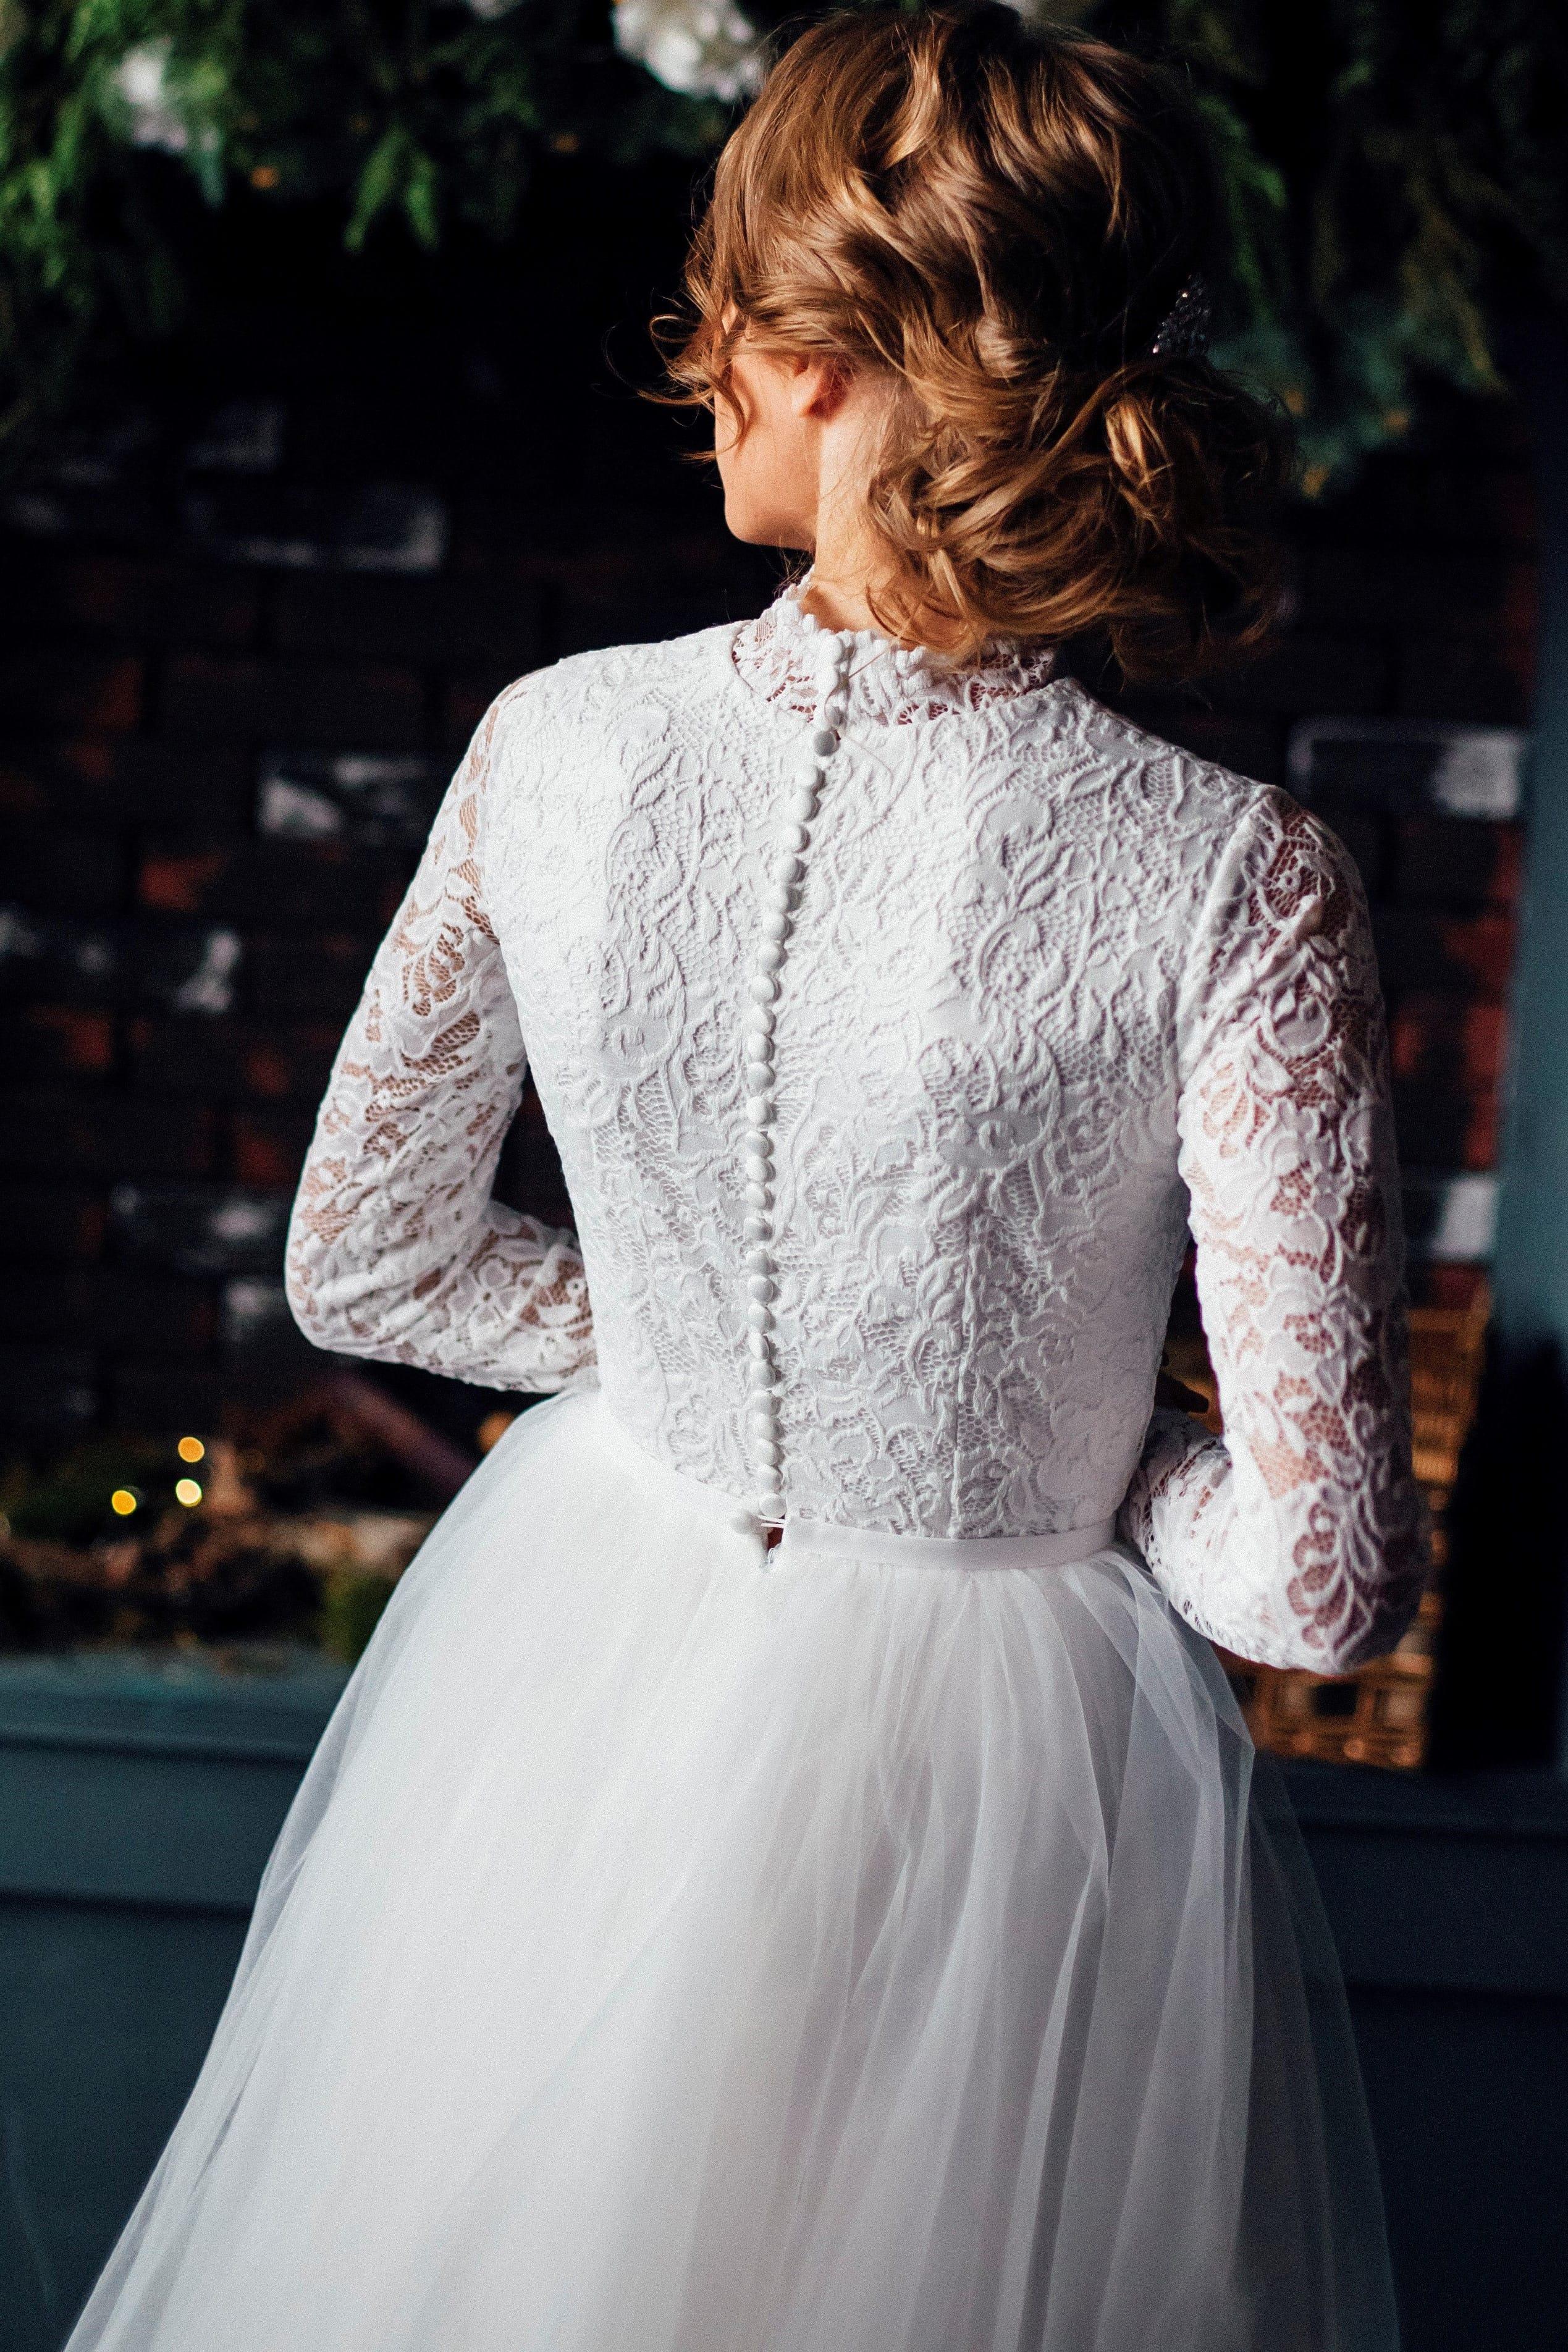 Свадебное платье CHRISTINE, коллекция THE ABSOLUTE LOVE, бренд RARE BRIDAL, фото 4